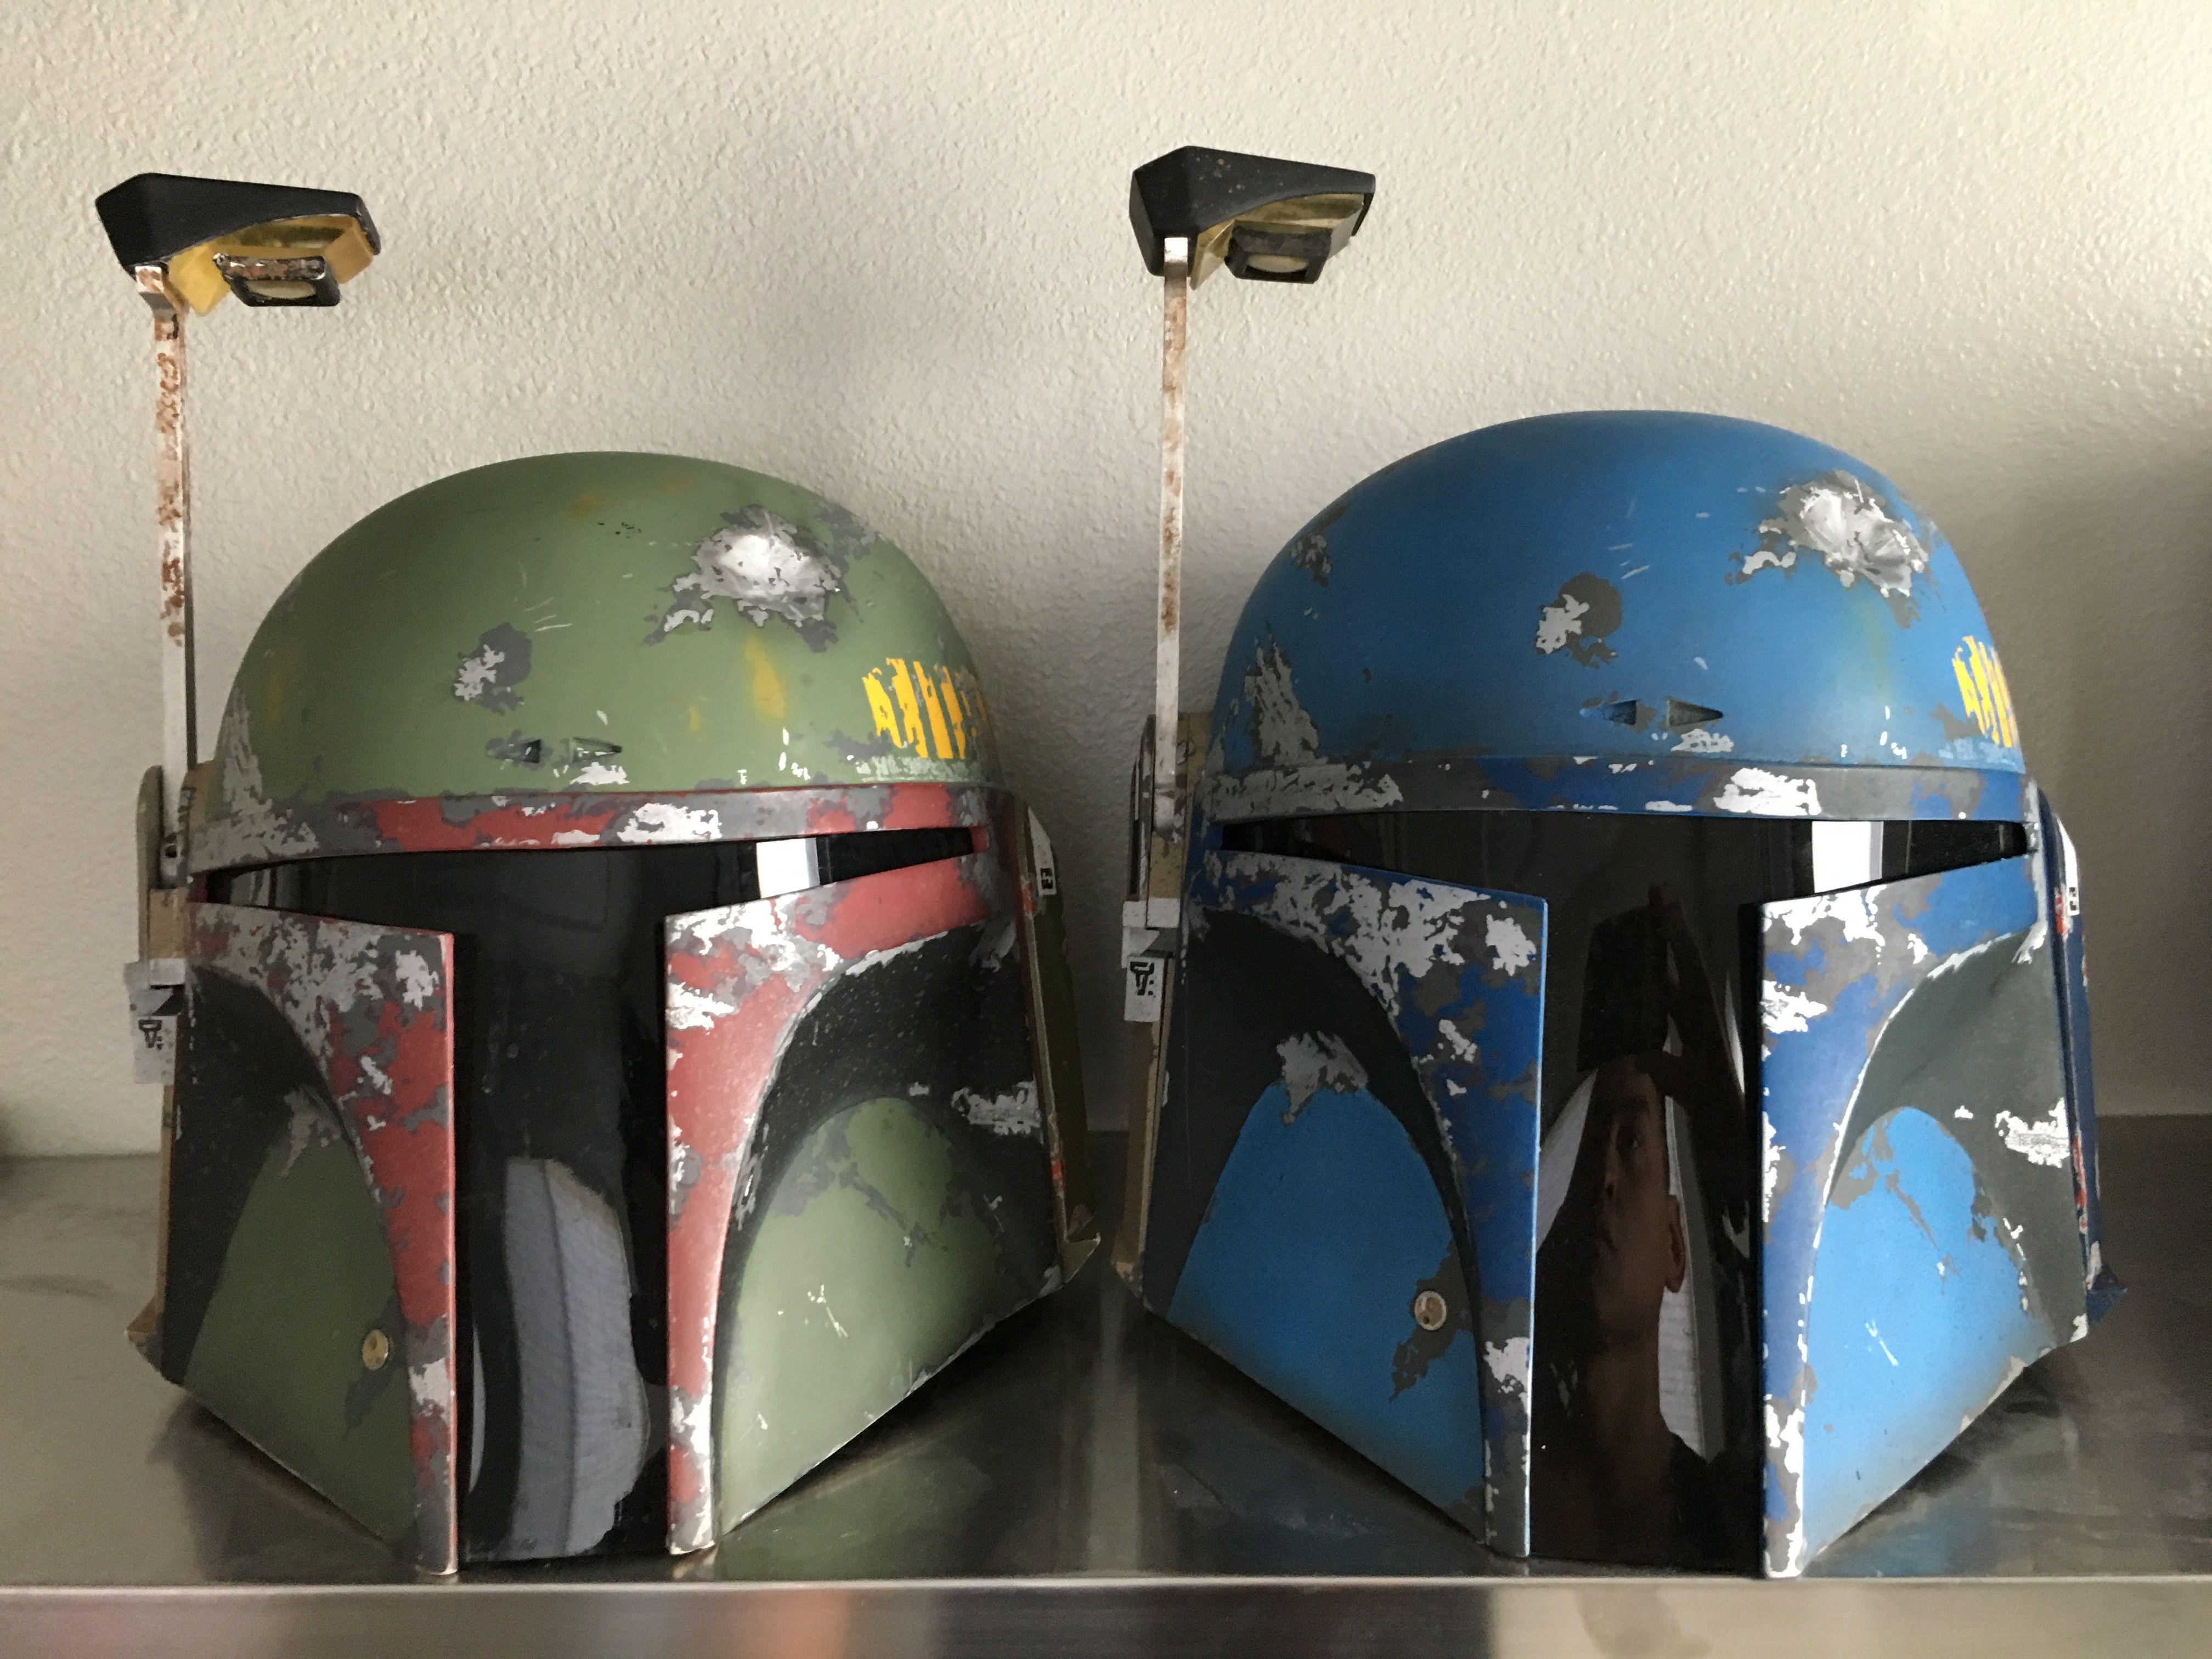 Pin von Wasted Fett auf Boba Fett Helmet | Pinterest